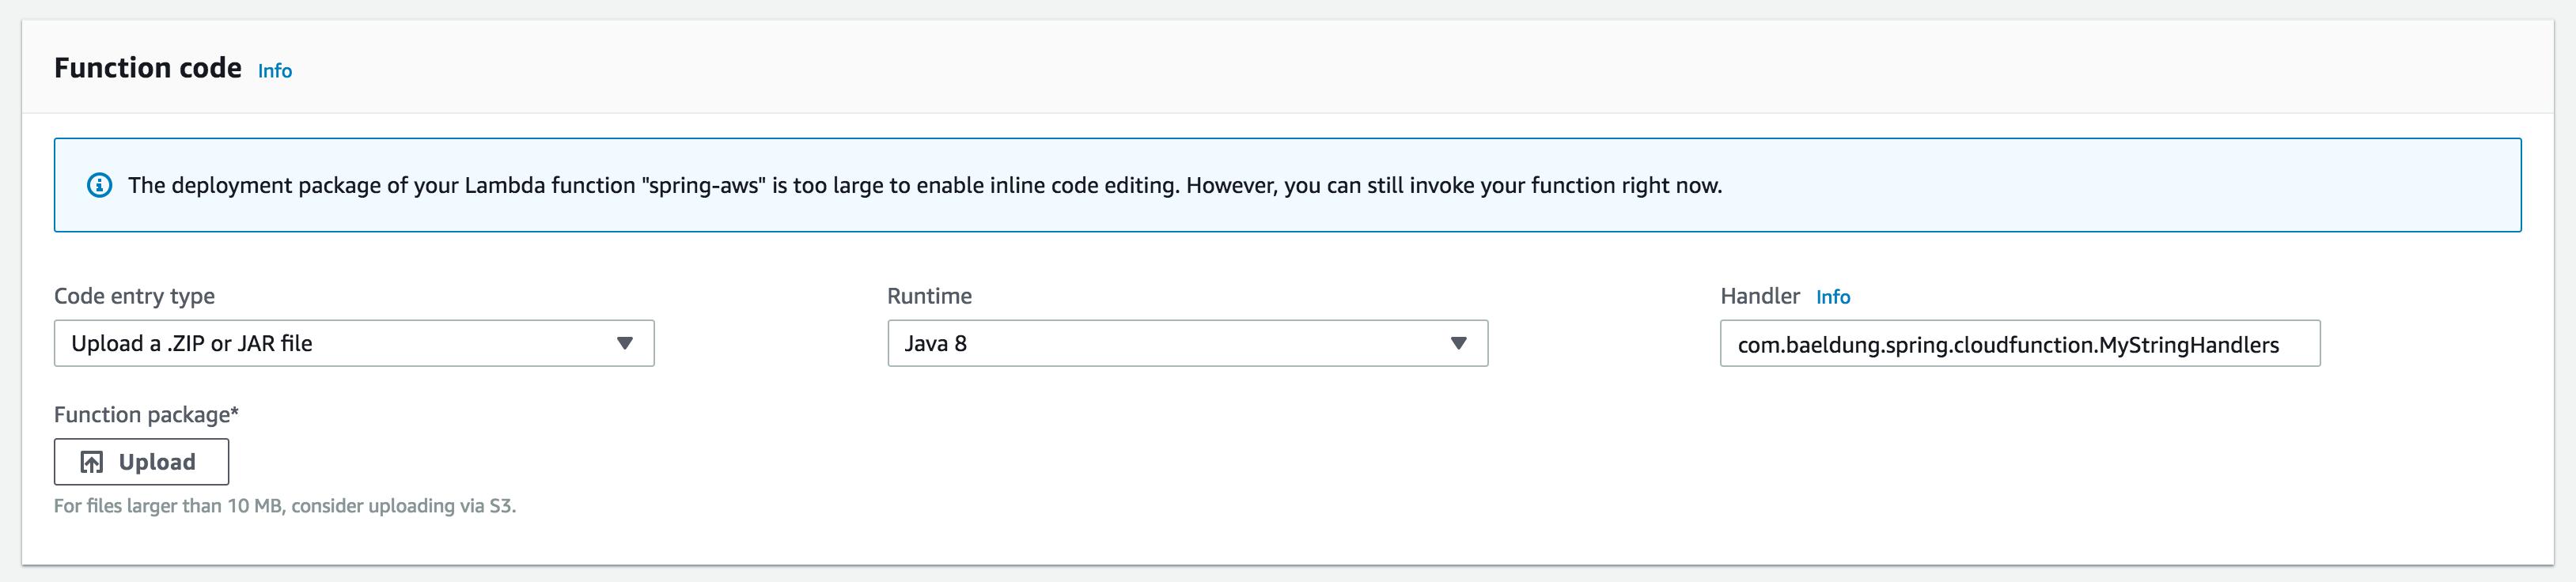 Serverless Functions with Spring Cloud Function | Baeldung